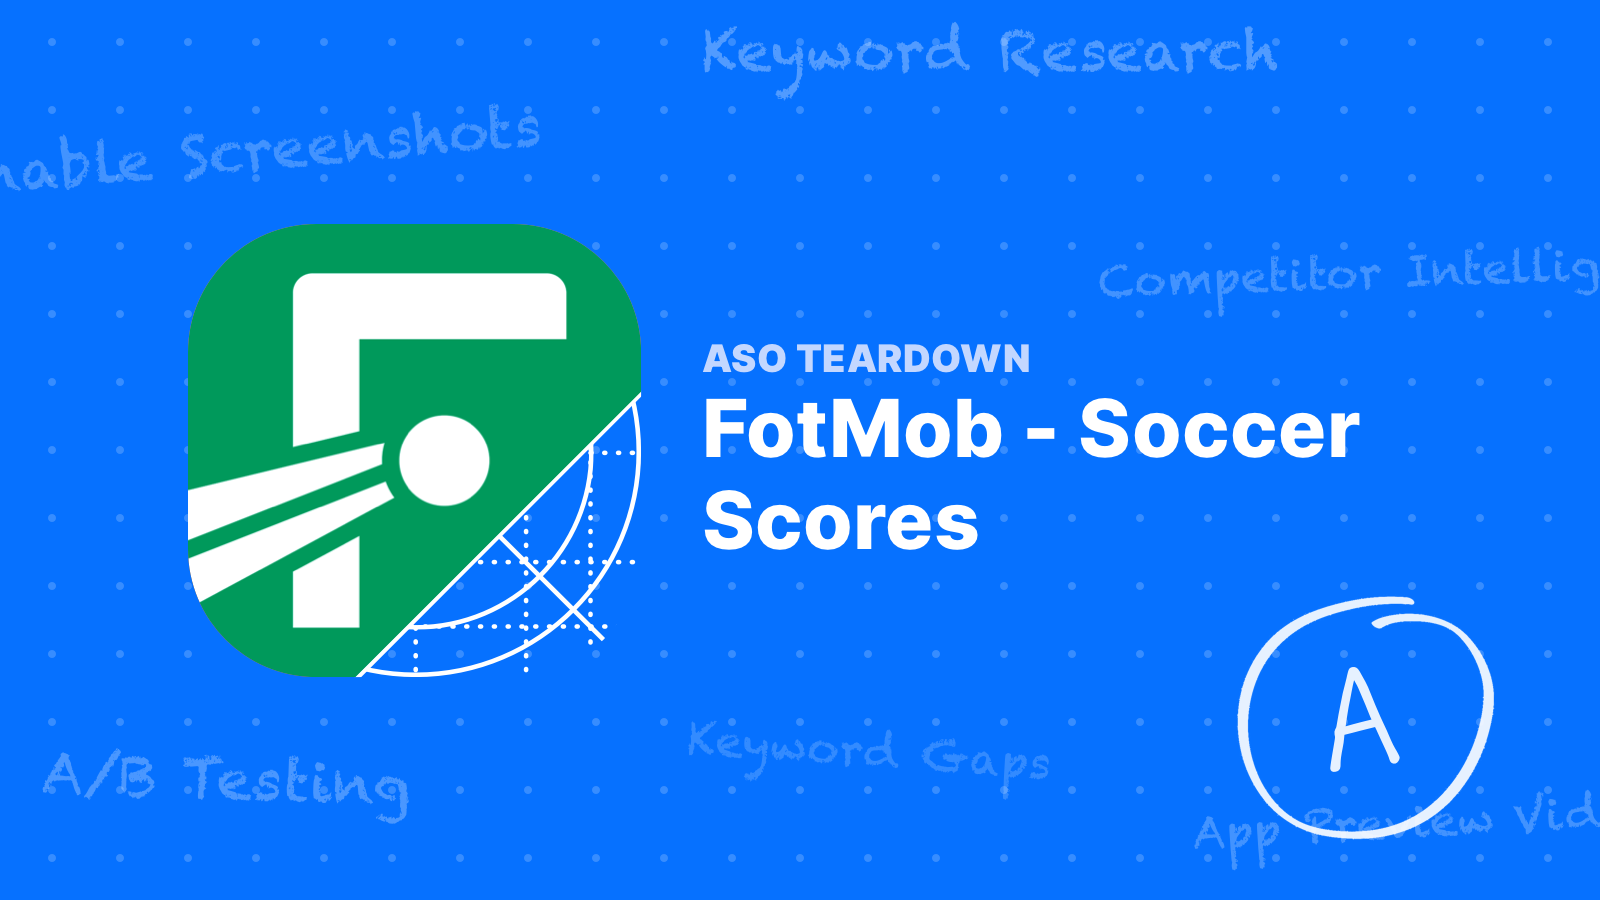 ASO Teardown: FotMob Takes the Lead with a Focused Keyword List